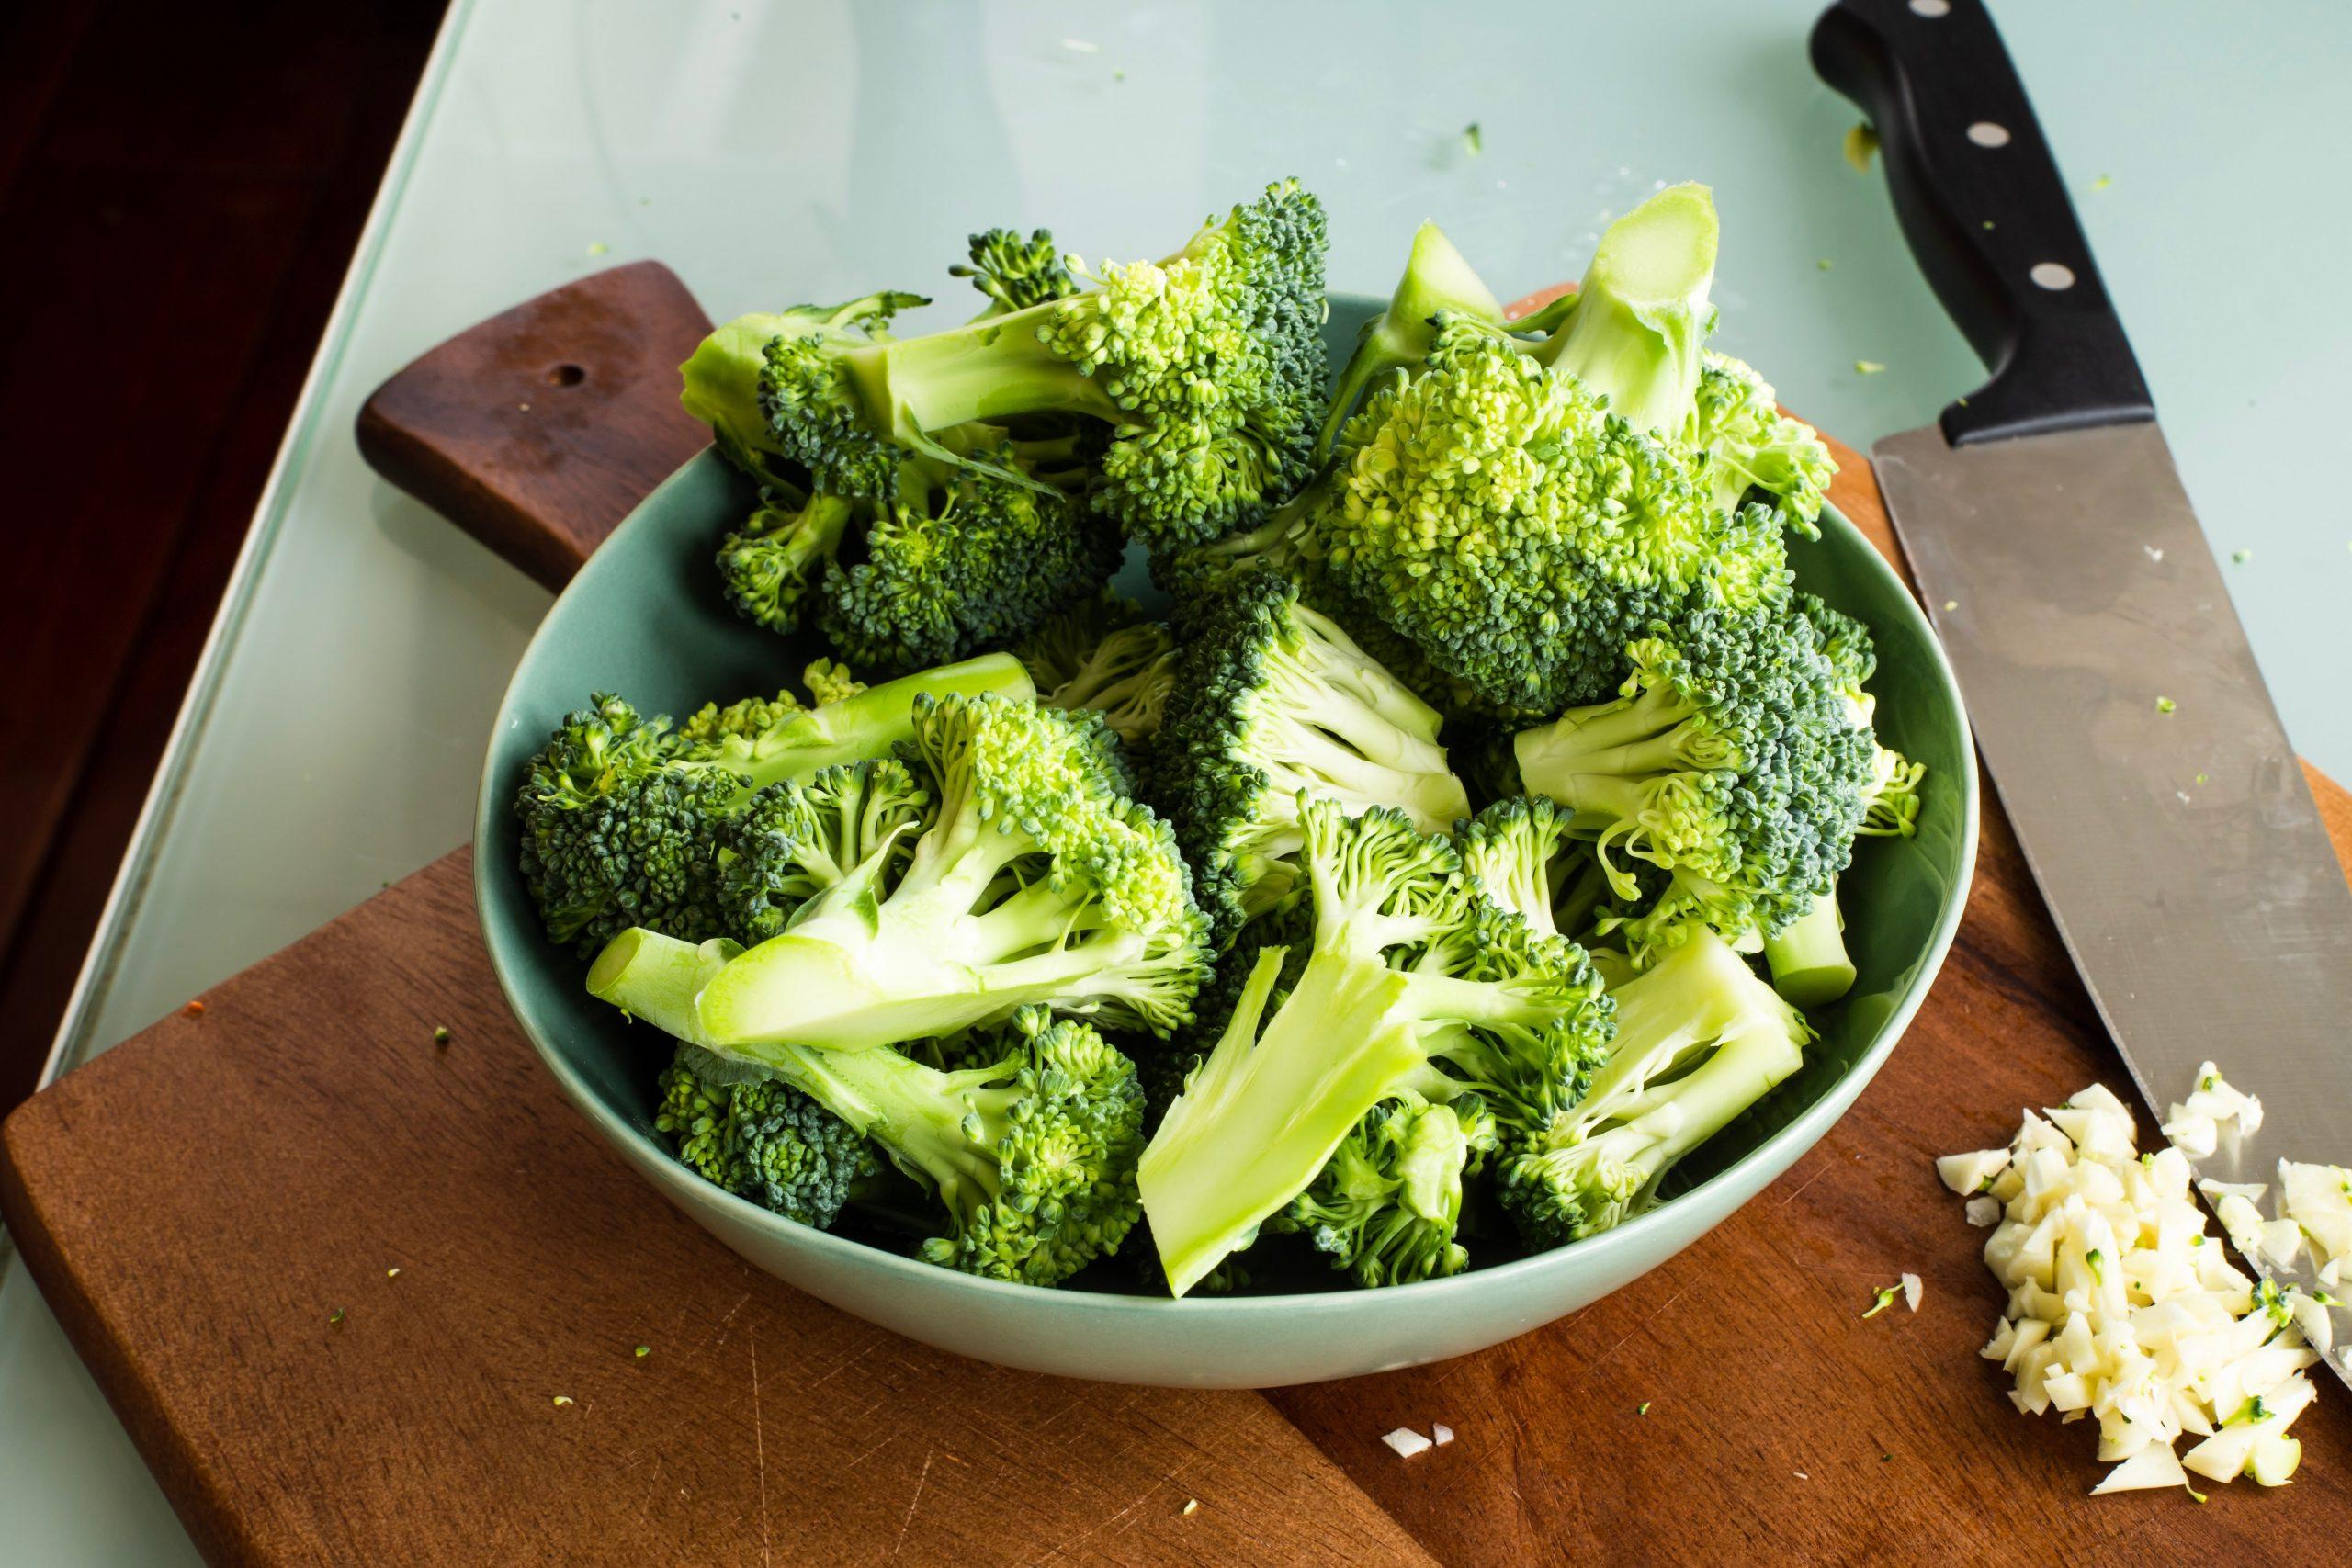 Broccoli als rijke bron van vitamine C